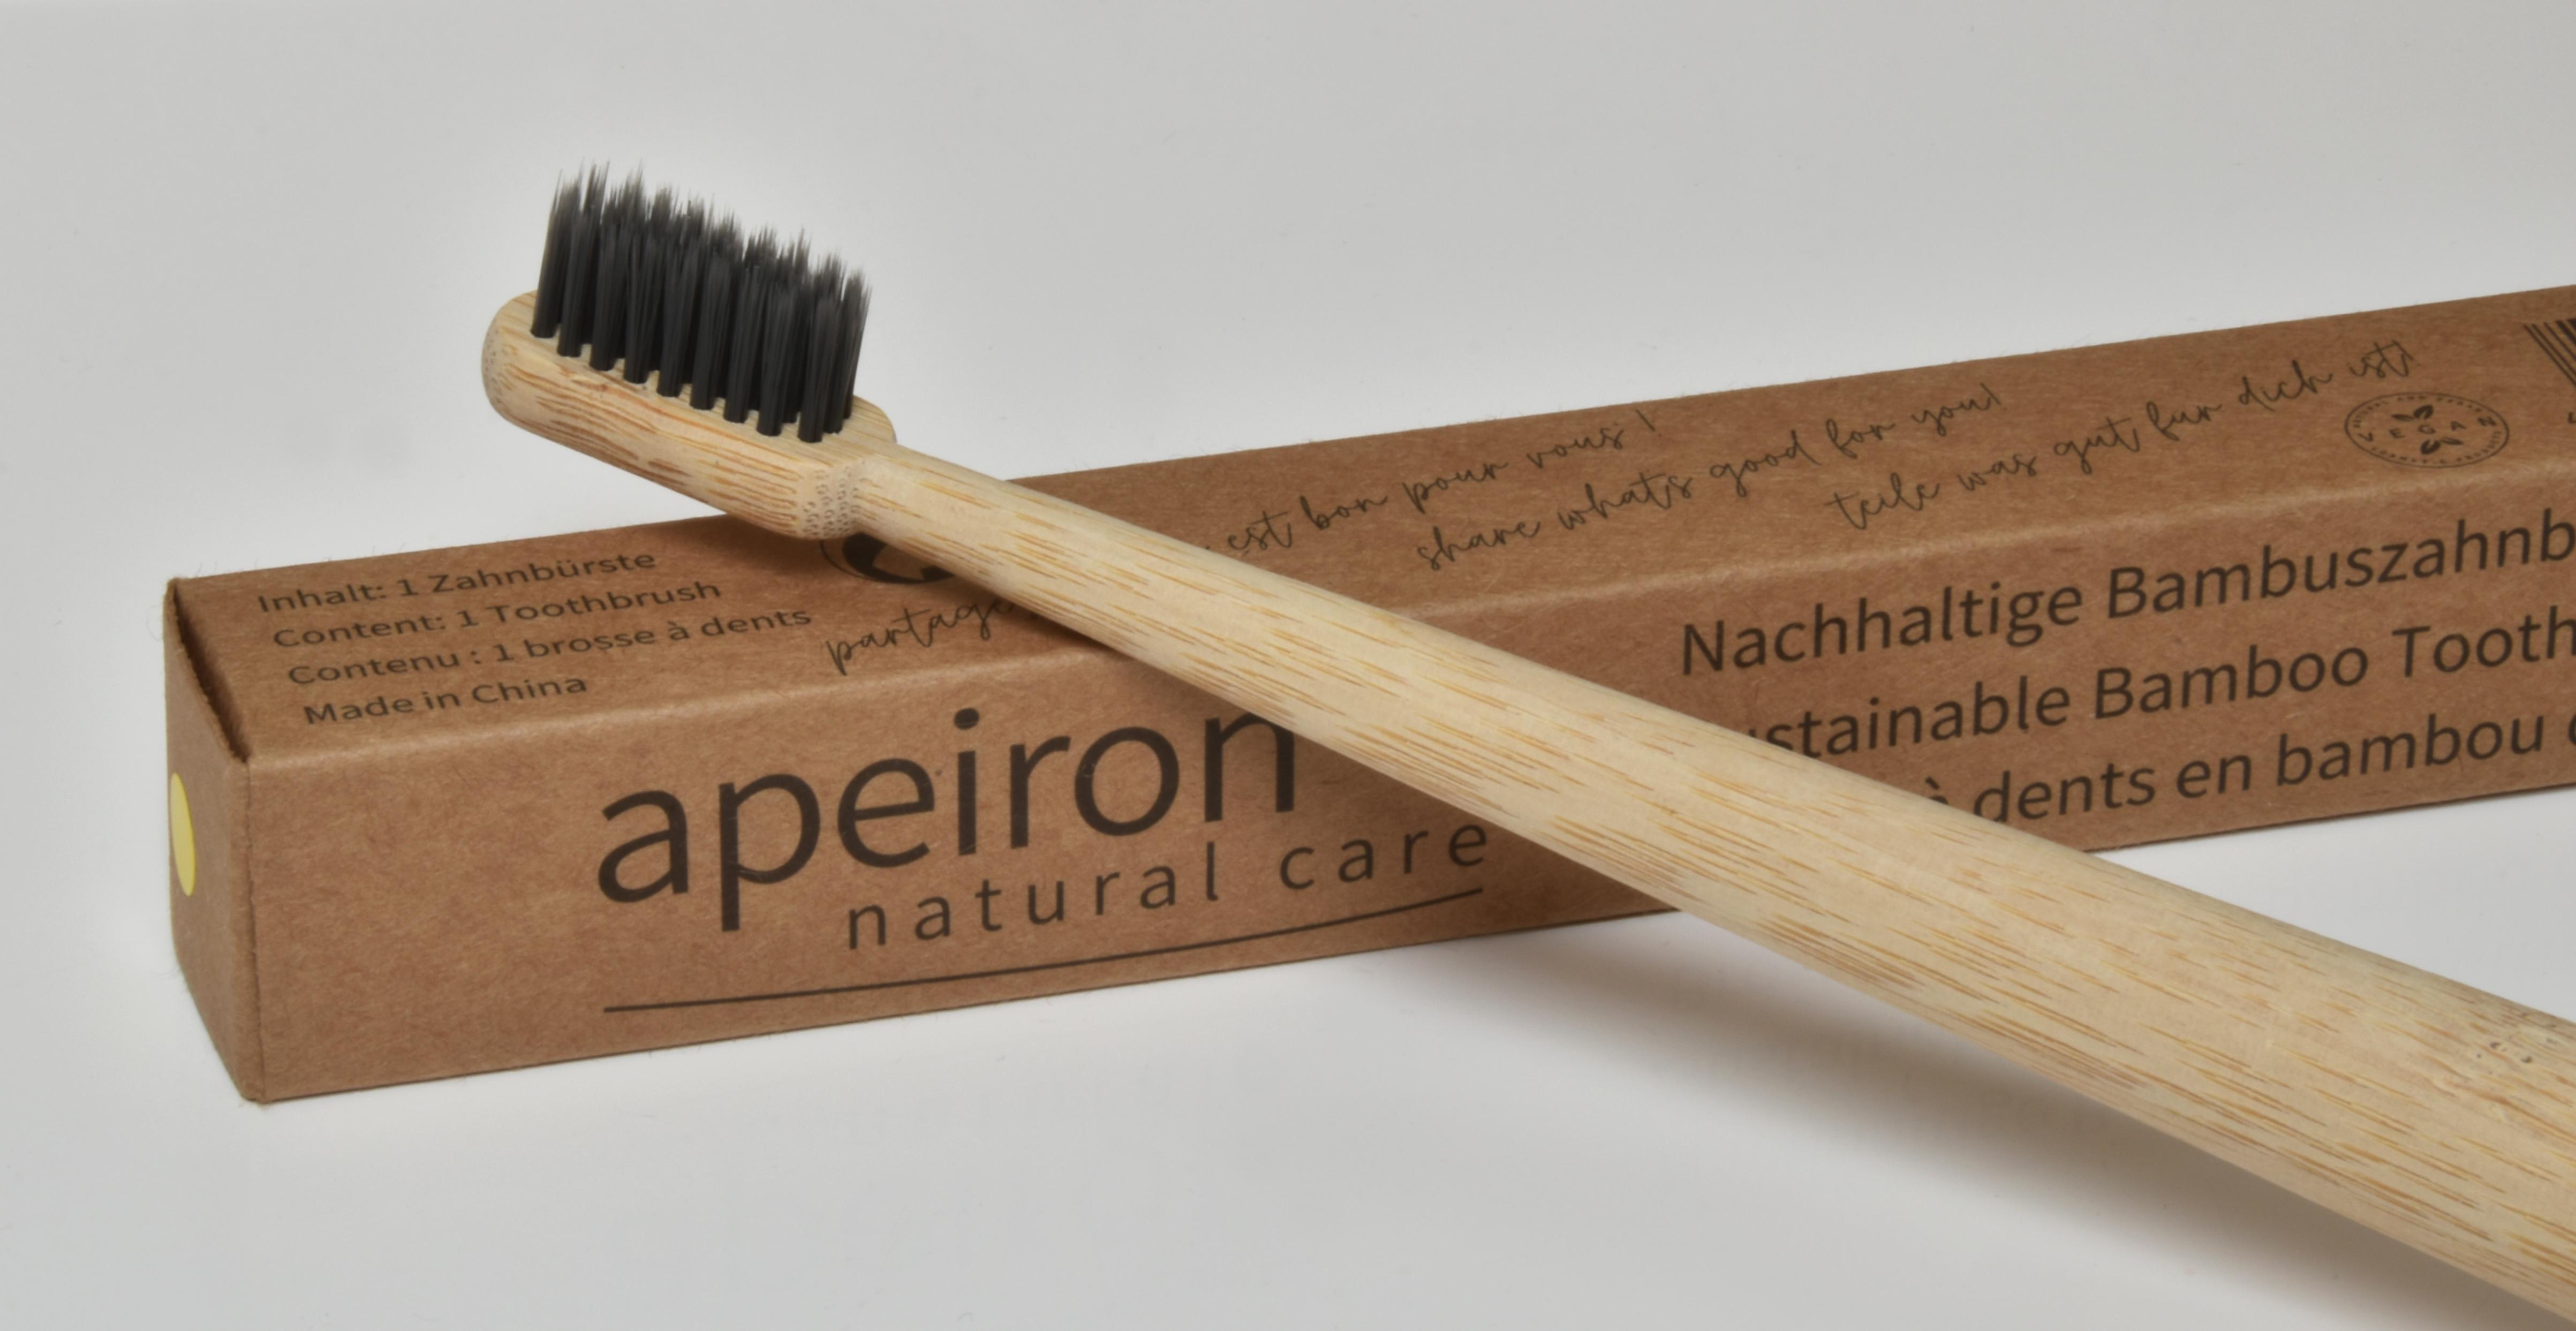 Bambus-Zahnbürste, natur - farbig markiert